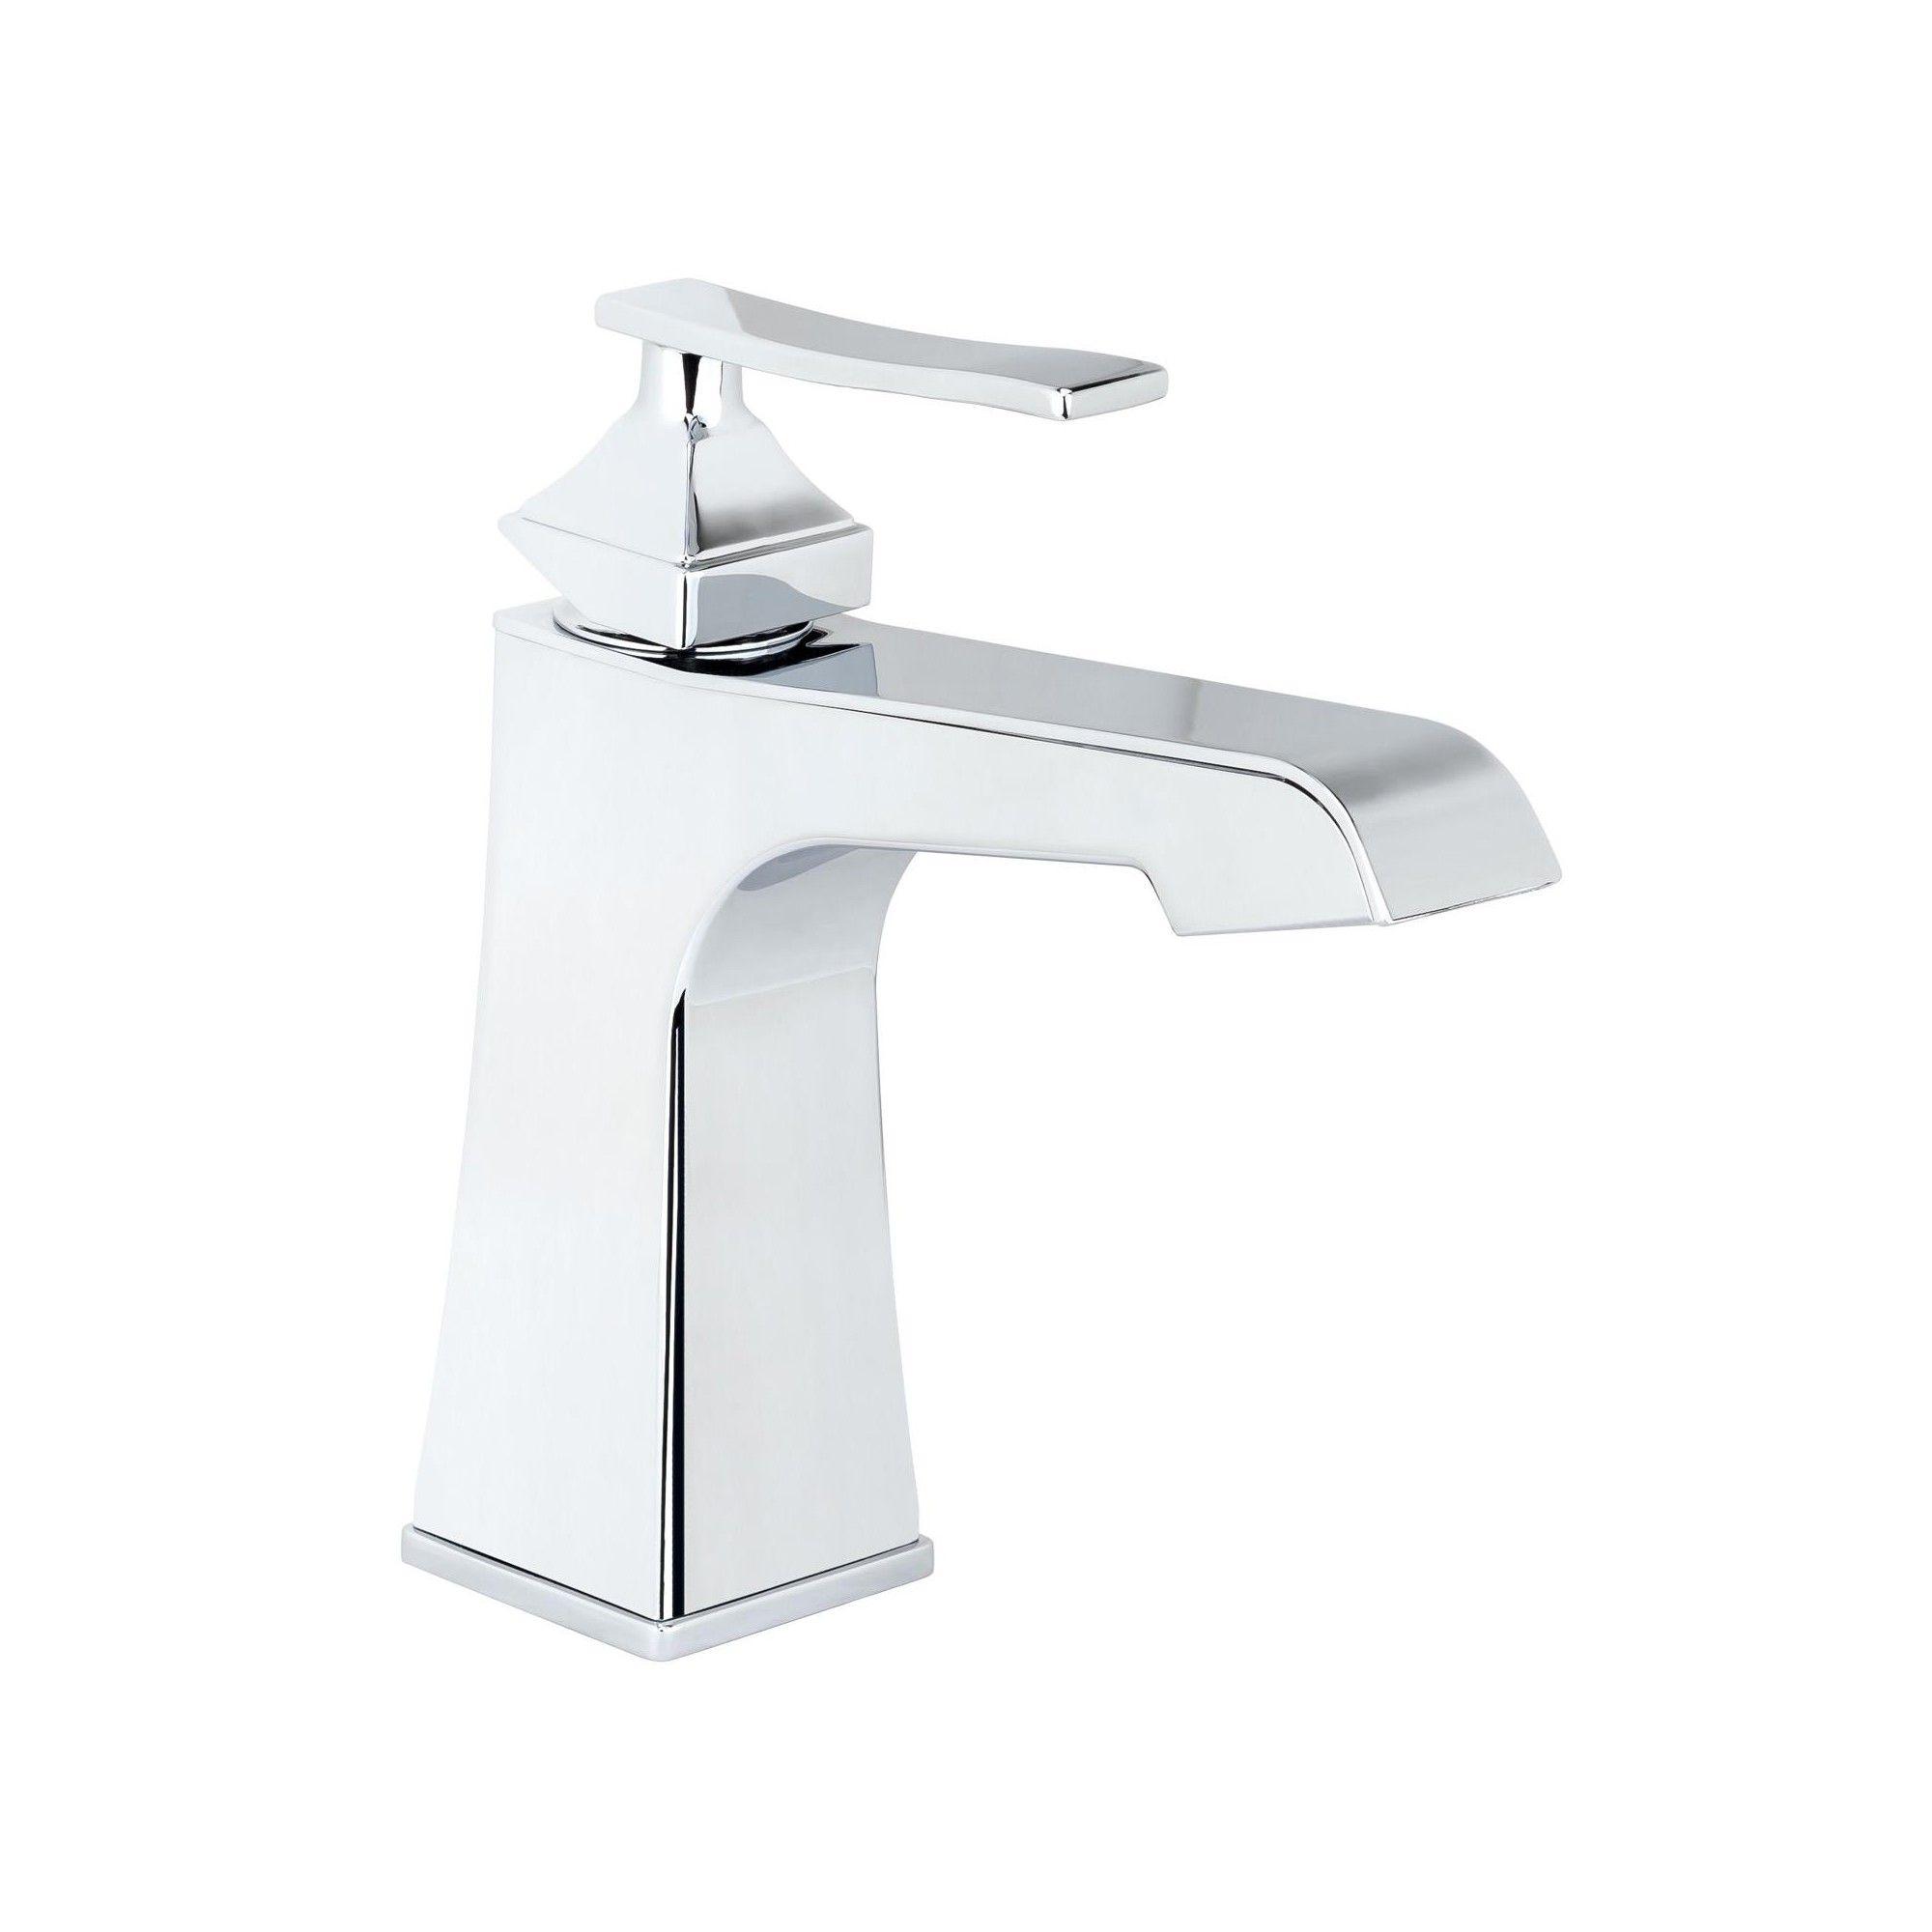 Miseno Ml811 Elysa B 1 2 Gpm Single Hole Bathroom Faucet With